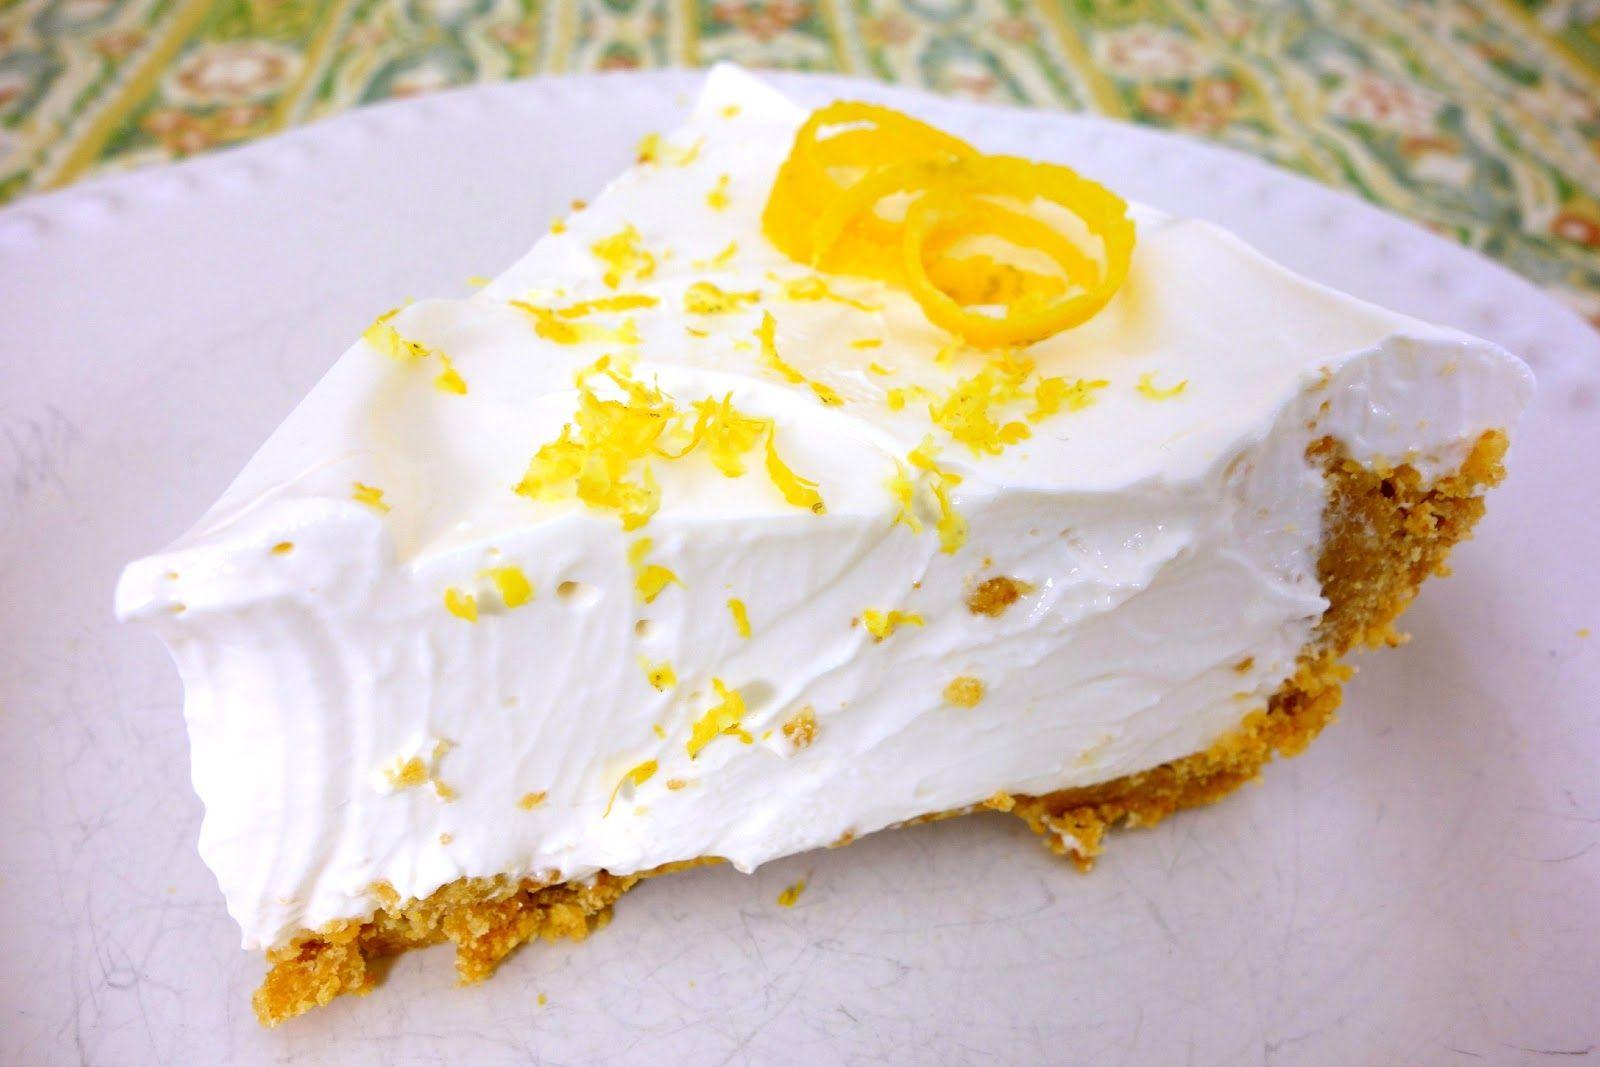 Pin By Tiffany Harbert On Yummy Recipes No Bake Lemon Pie Desserts Baking